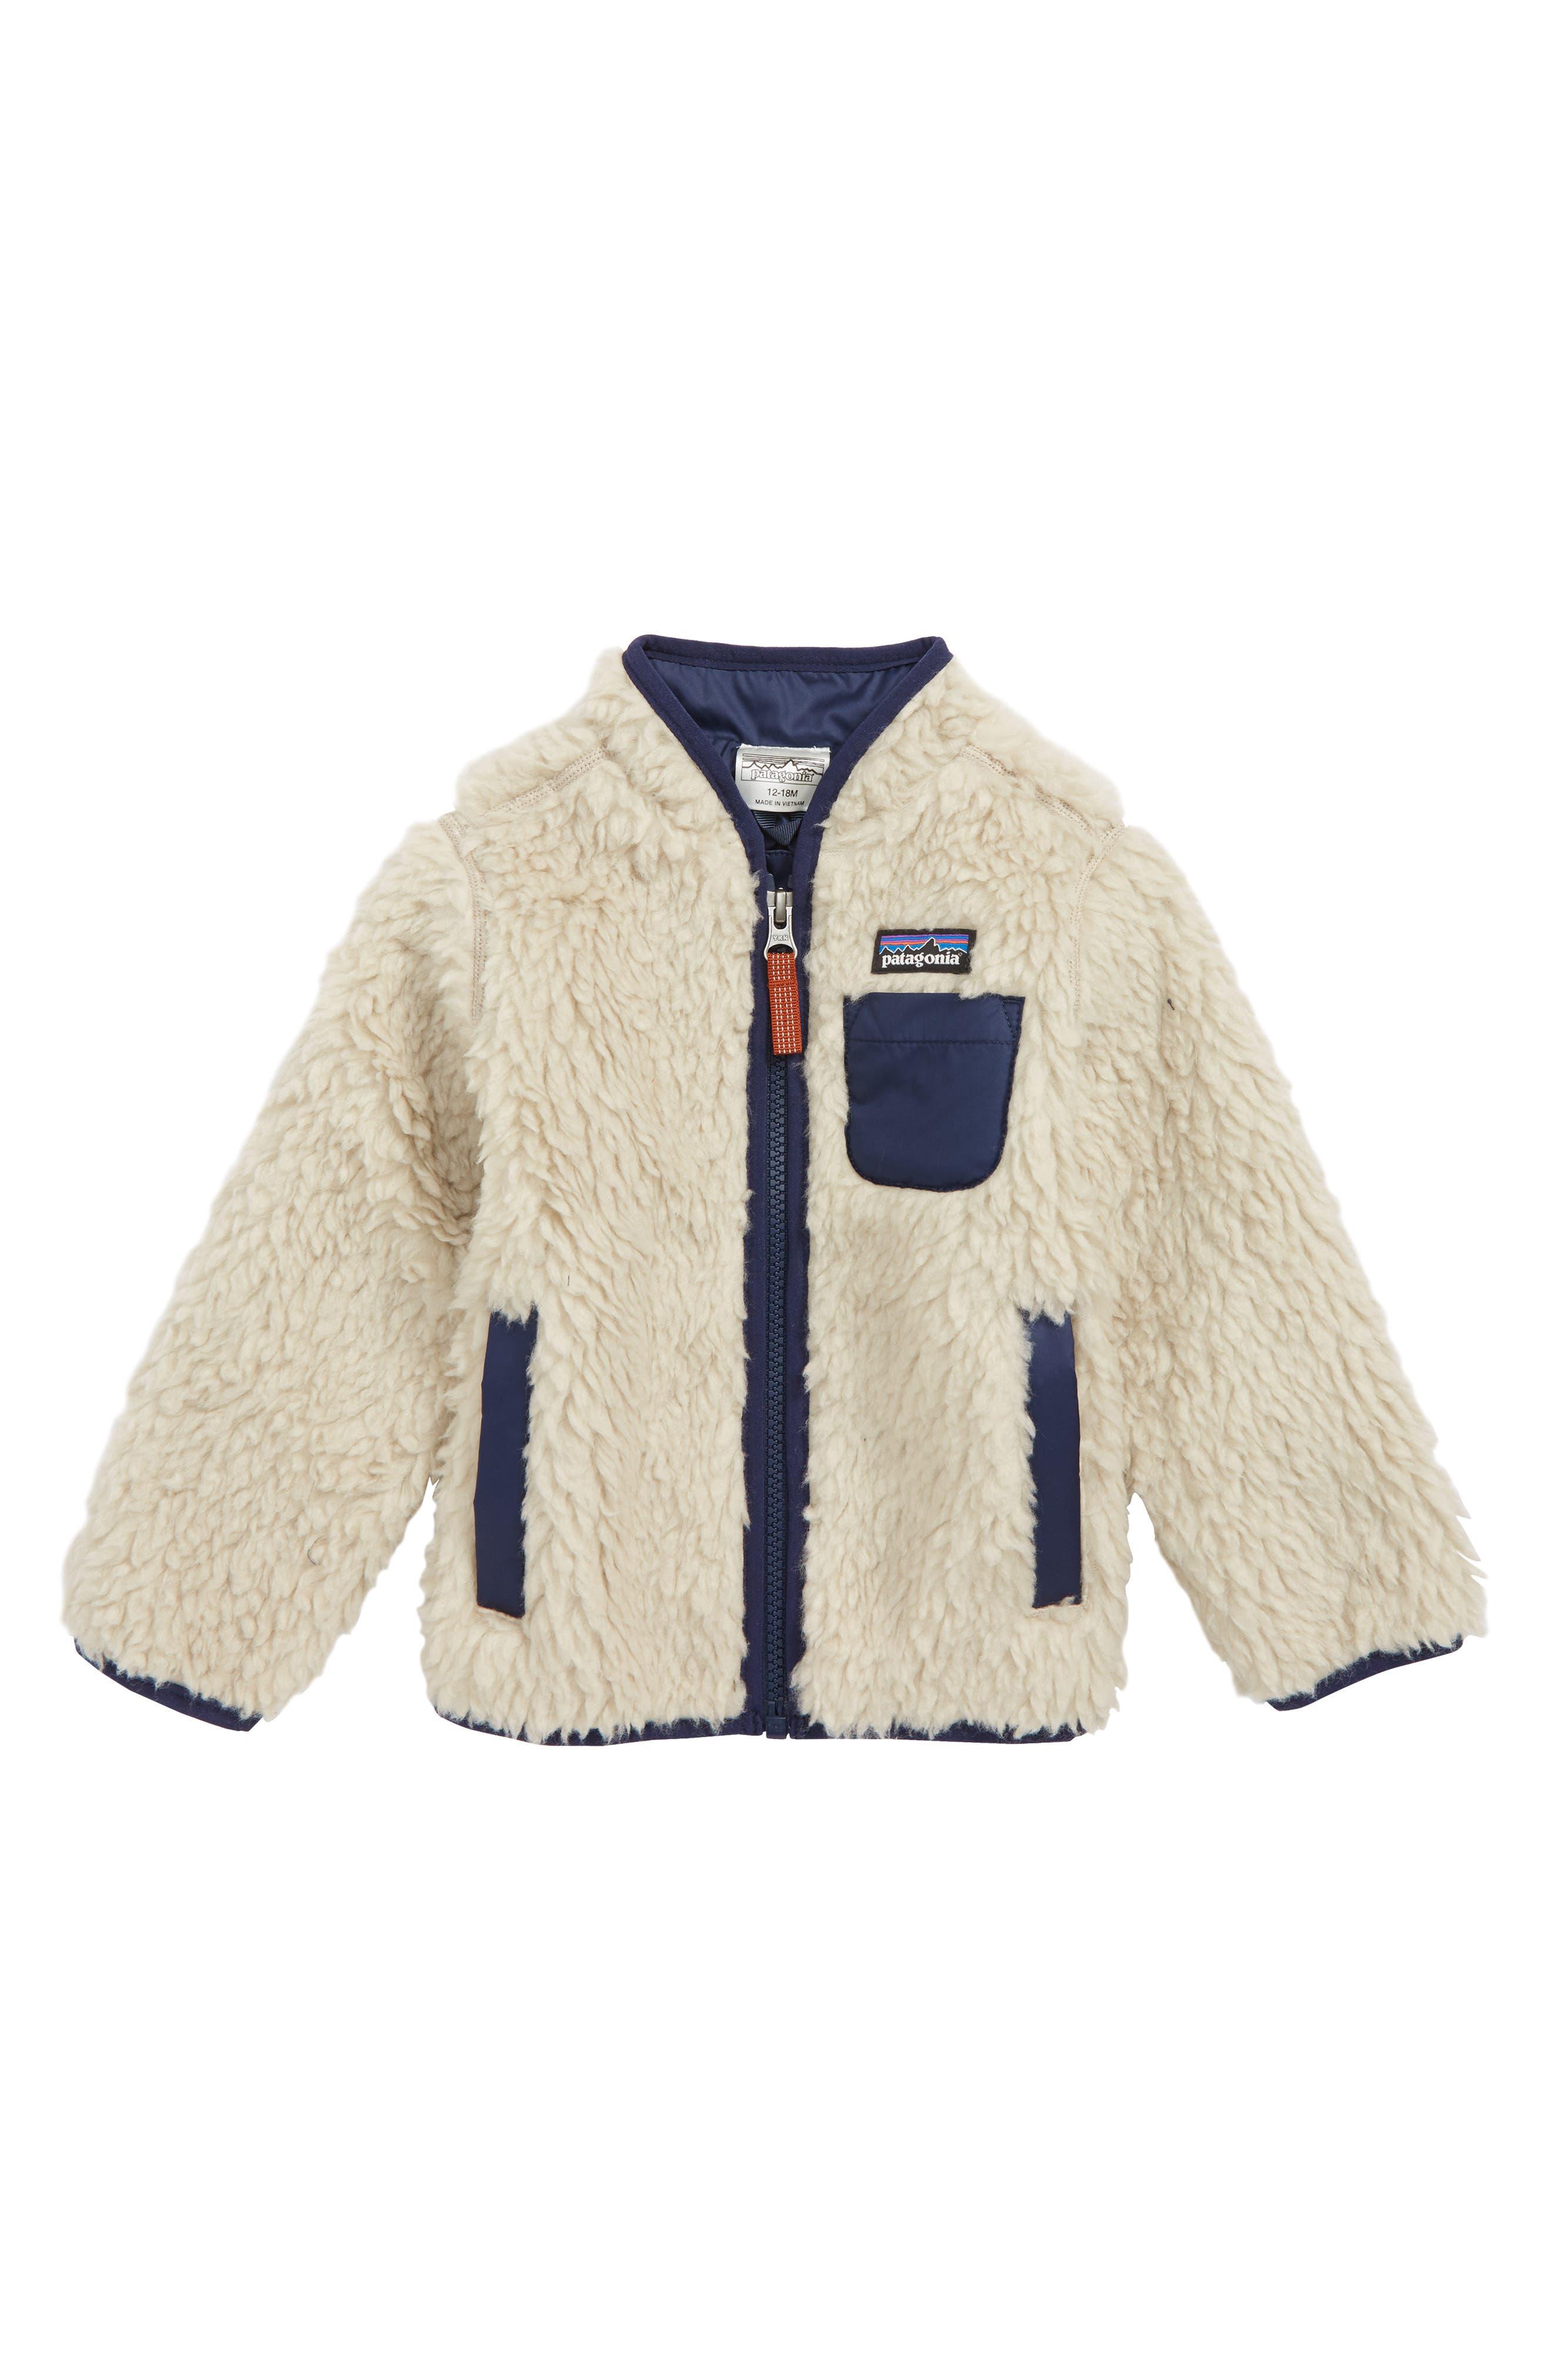 Retro-X Windproof Jacket,                         Main,                         color, NCV NATURAL W/ CLASSIC NAVY